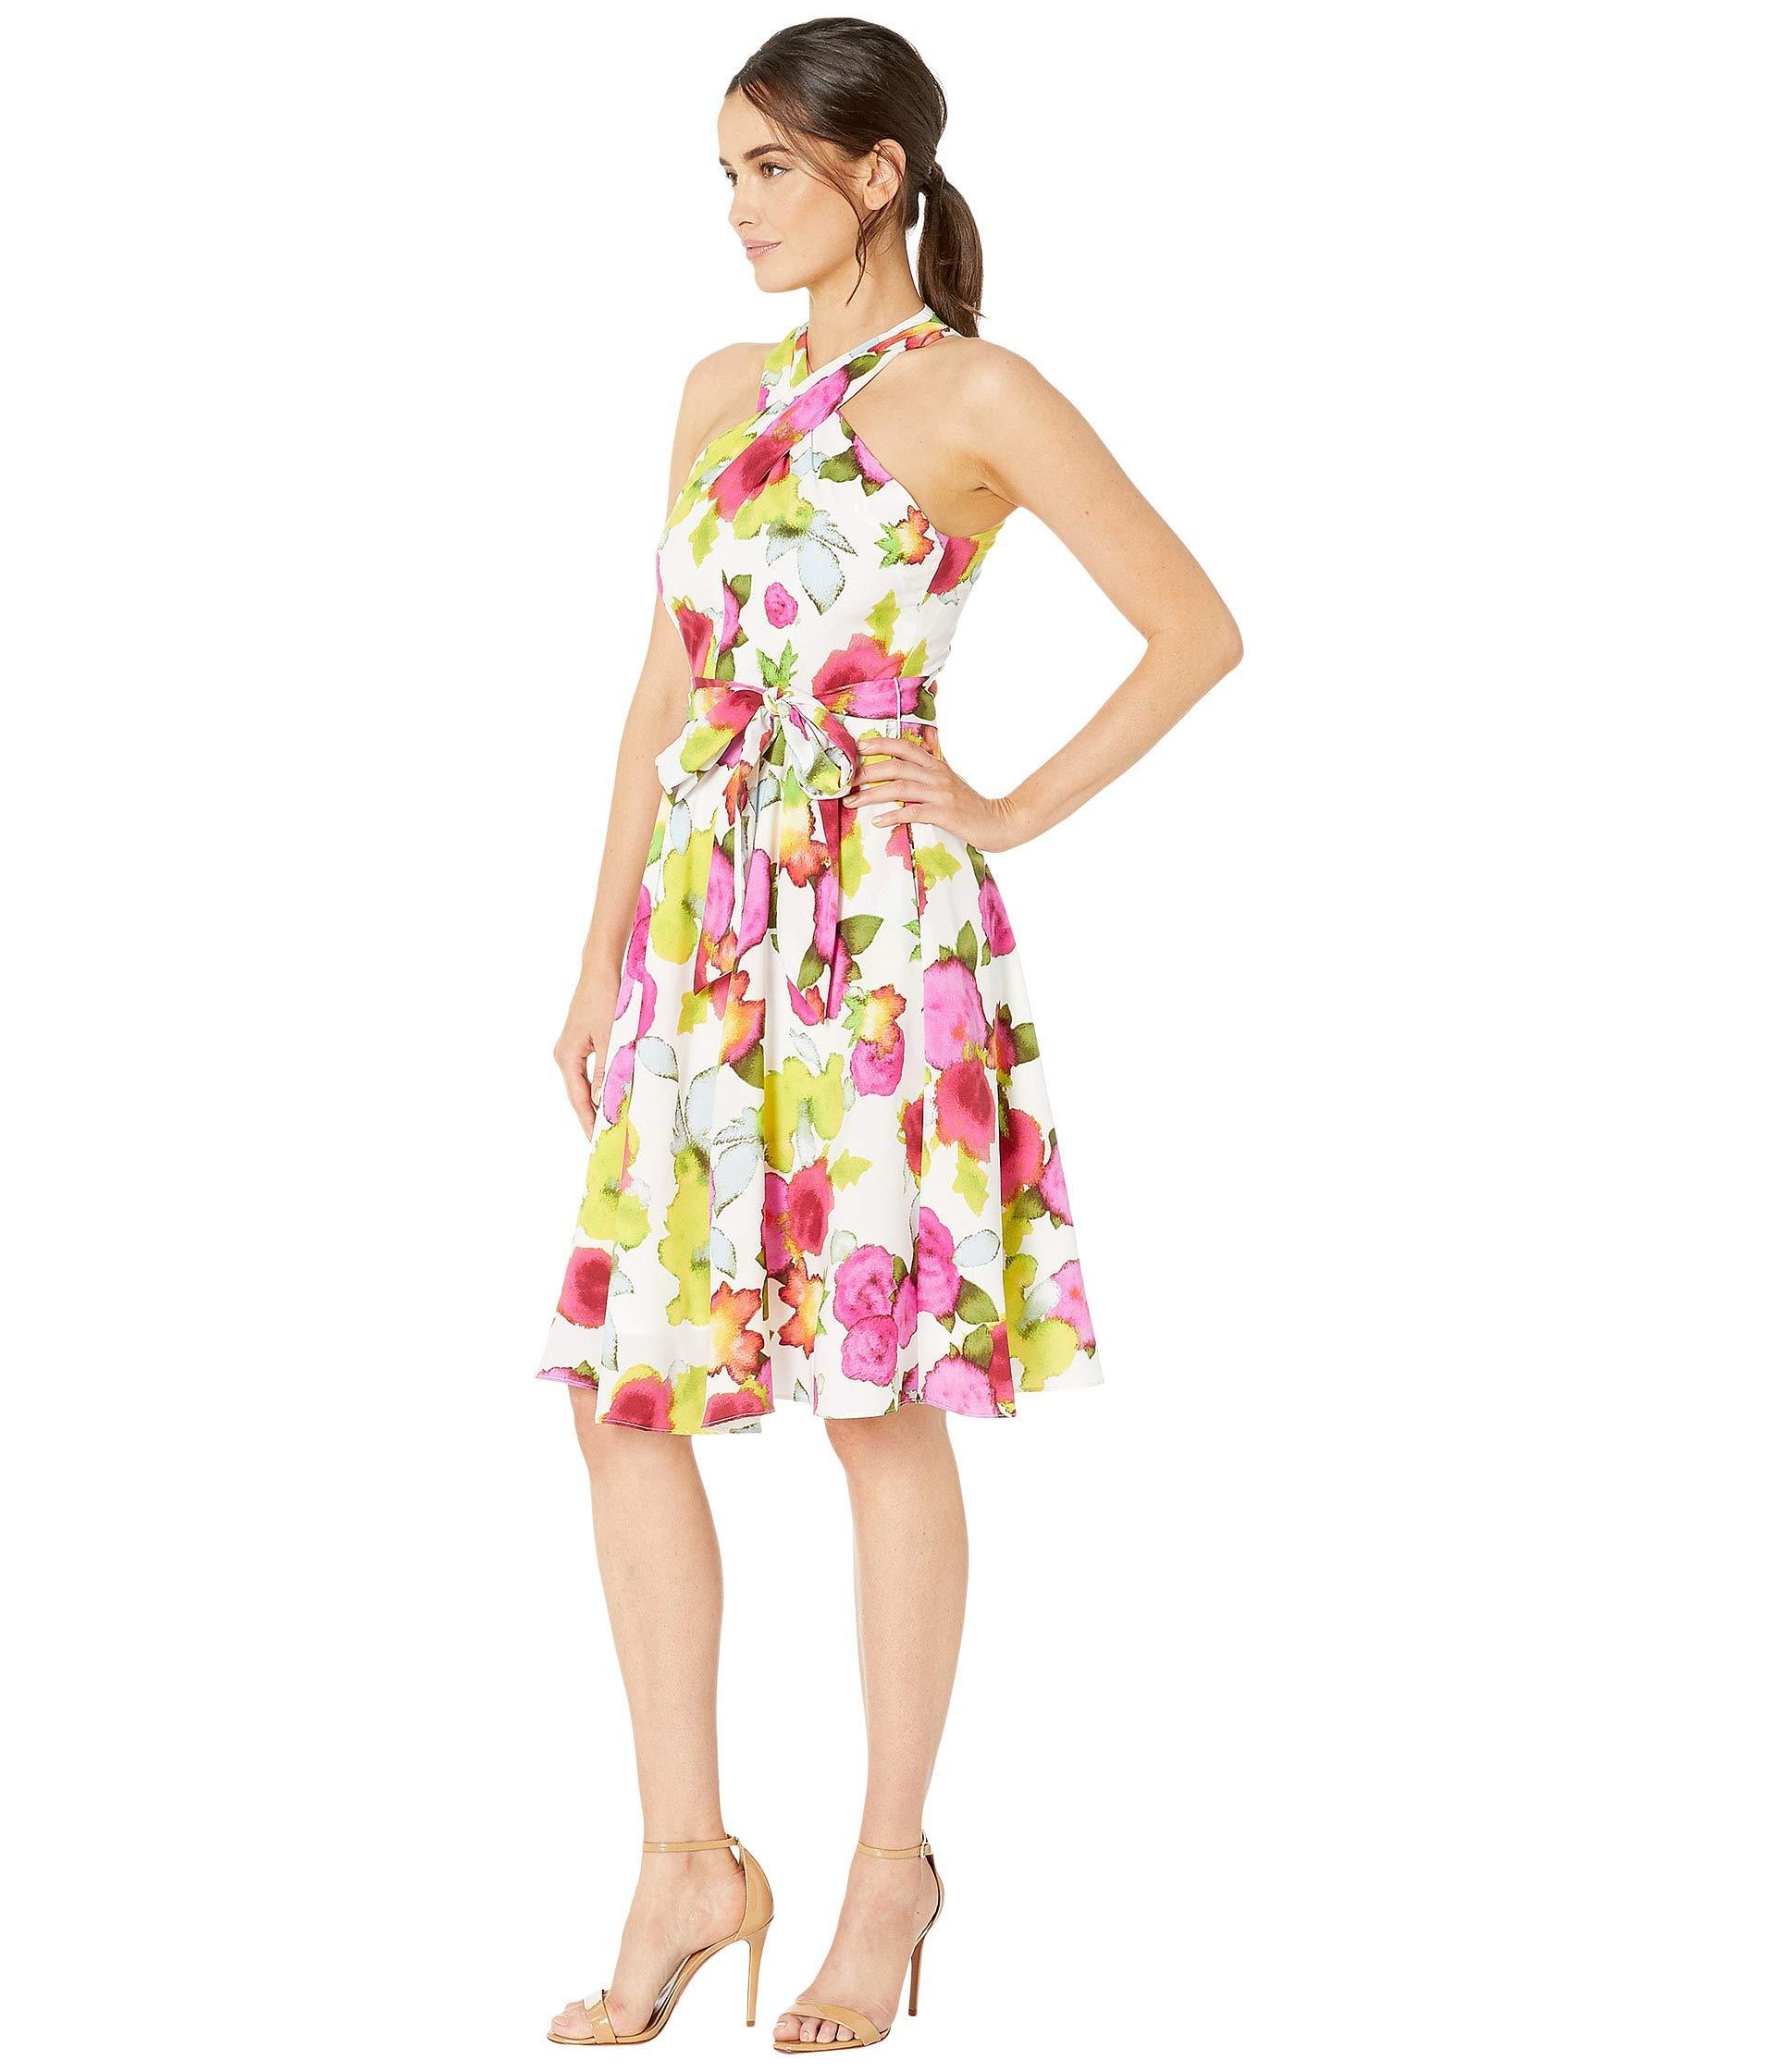 Tahari Synthetic Crisscross Halter Neck Georgette Dress